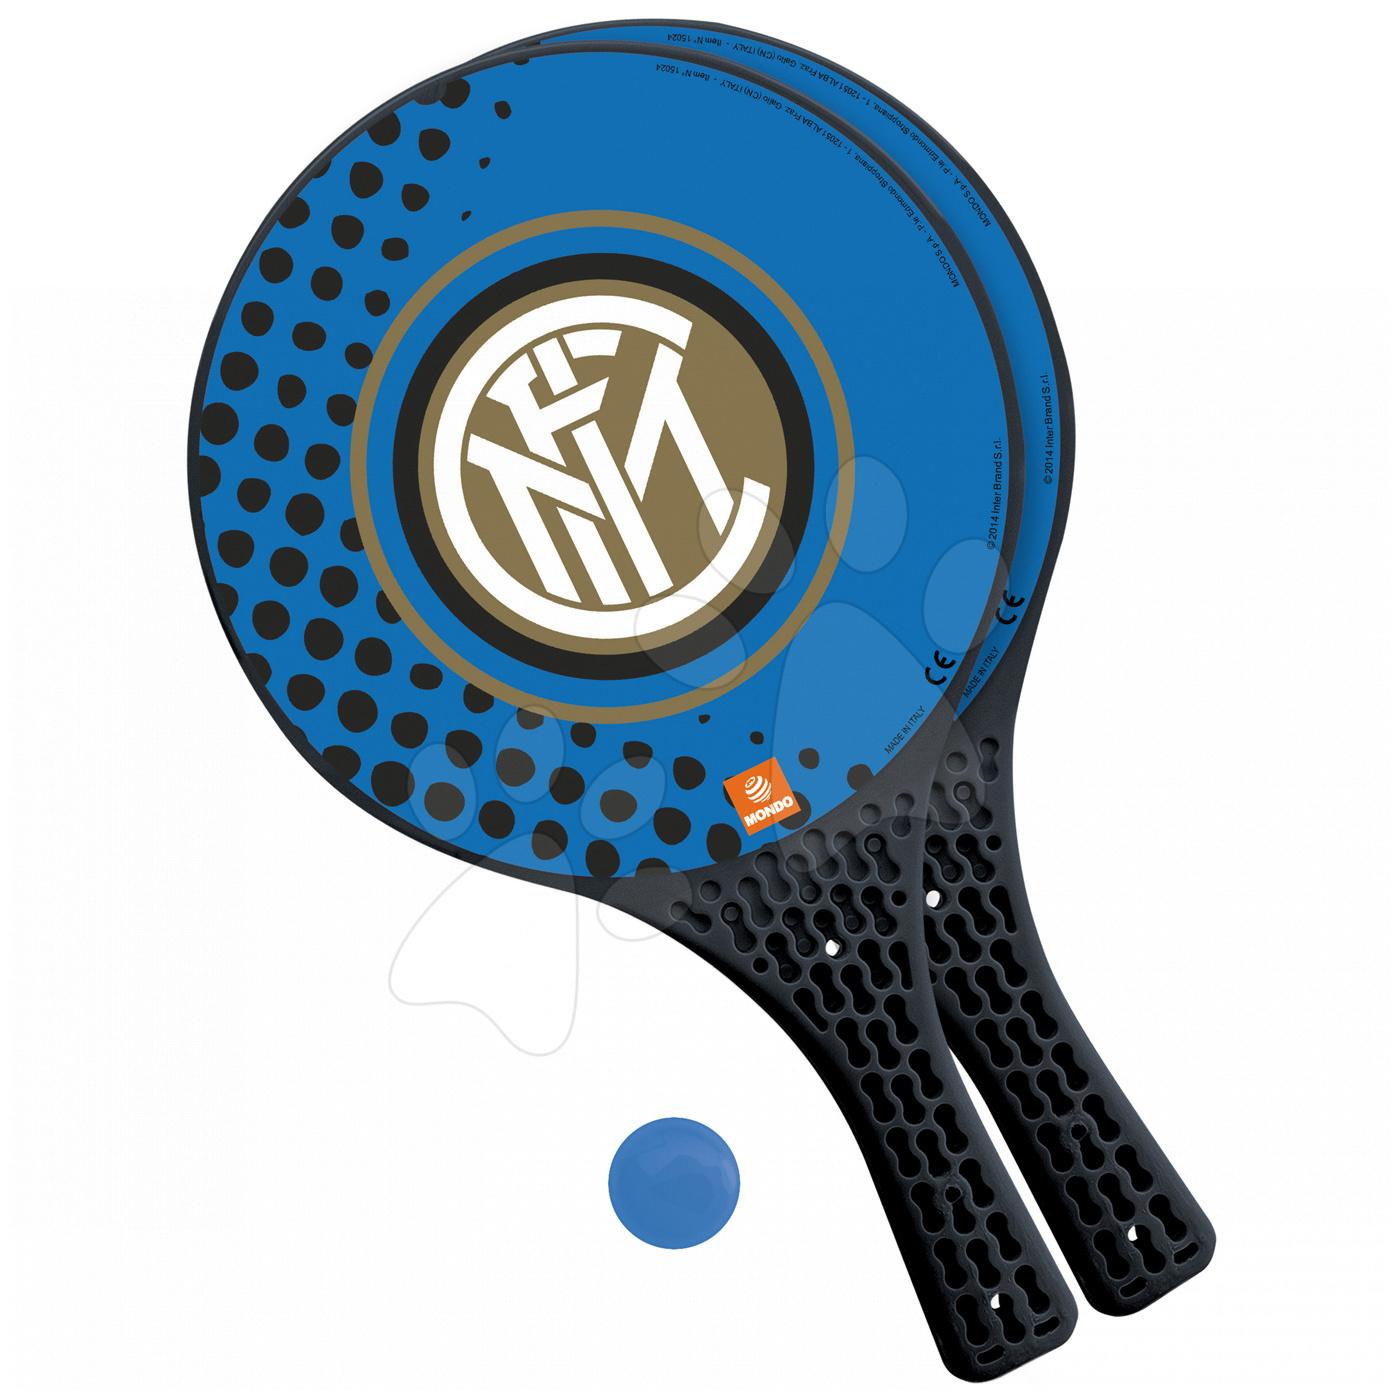 Plážový tenis F. C. Inter Mondo s 2 raketami a míčkem modrý